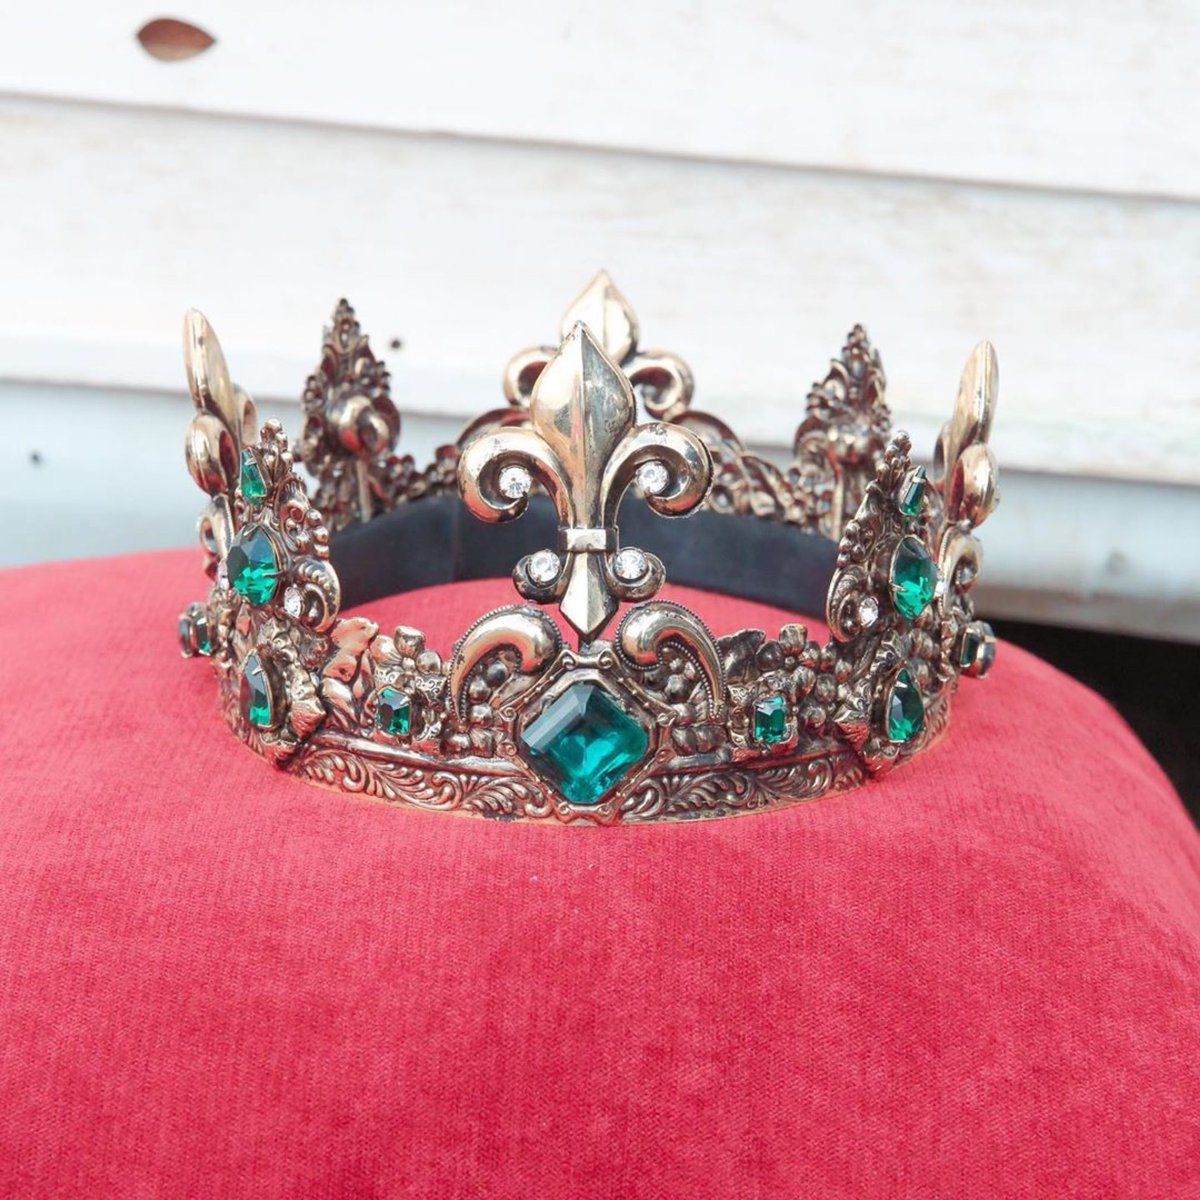 We all got crowns 👑💕